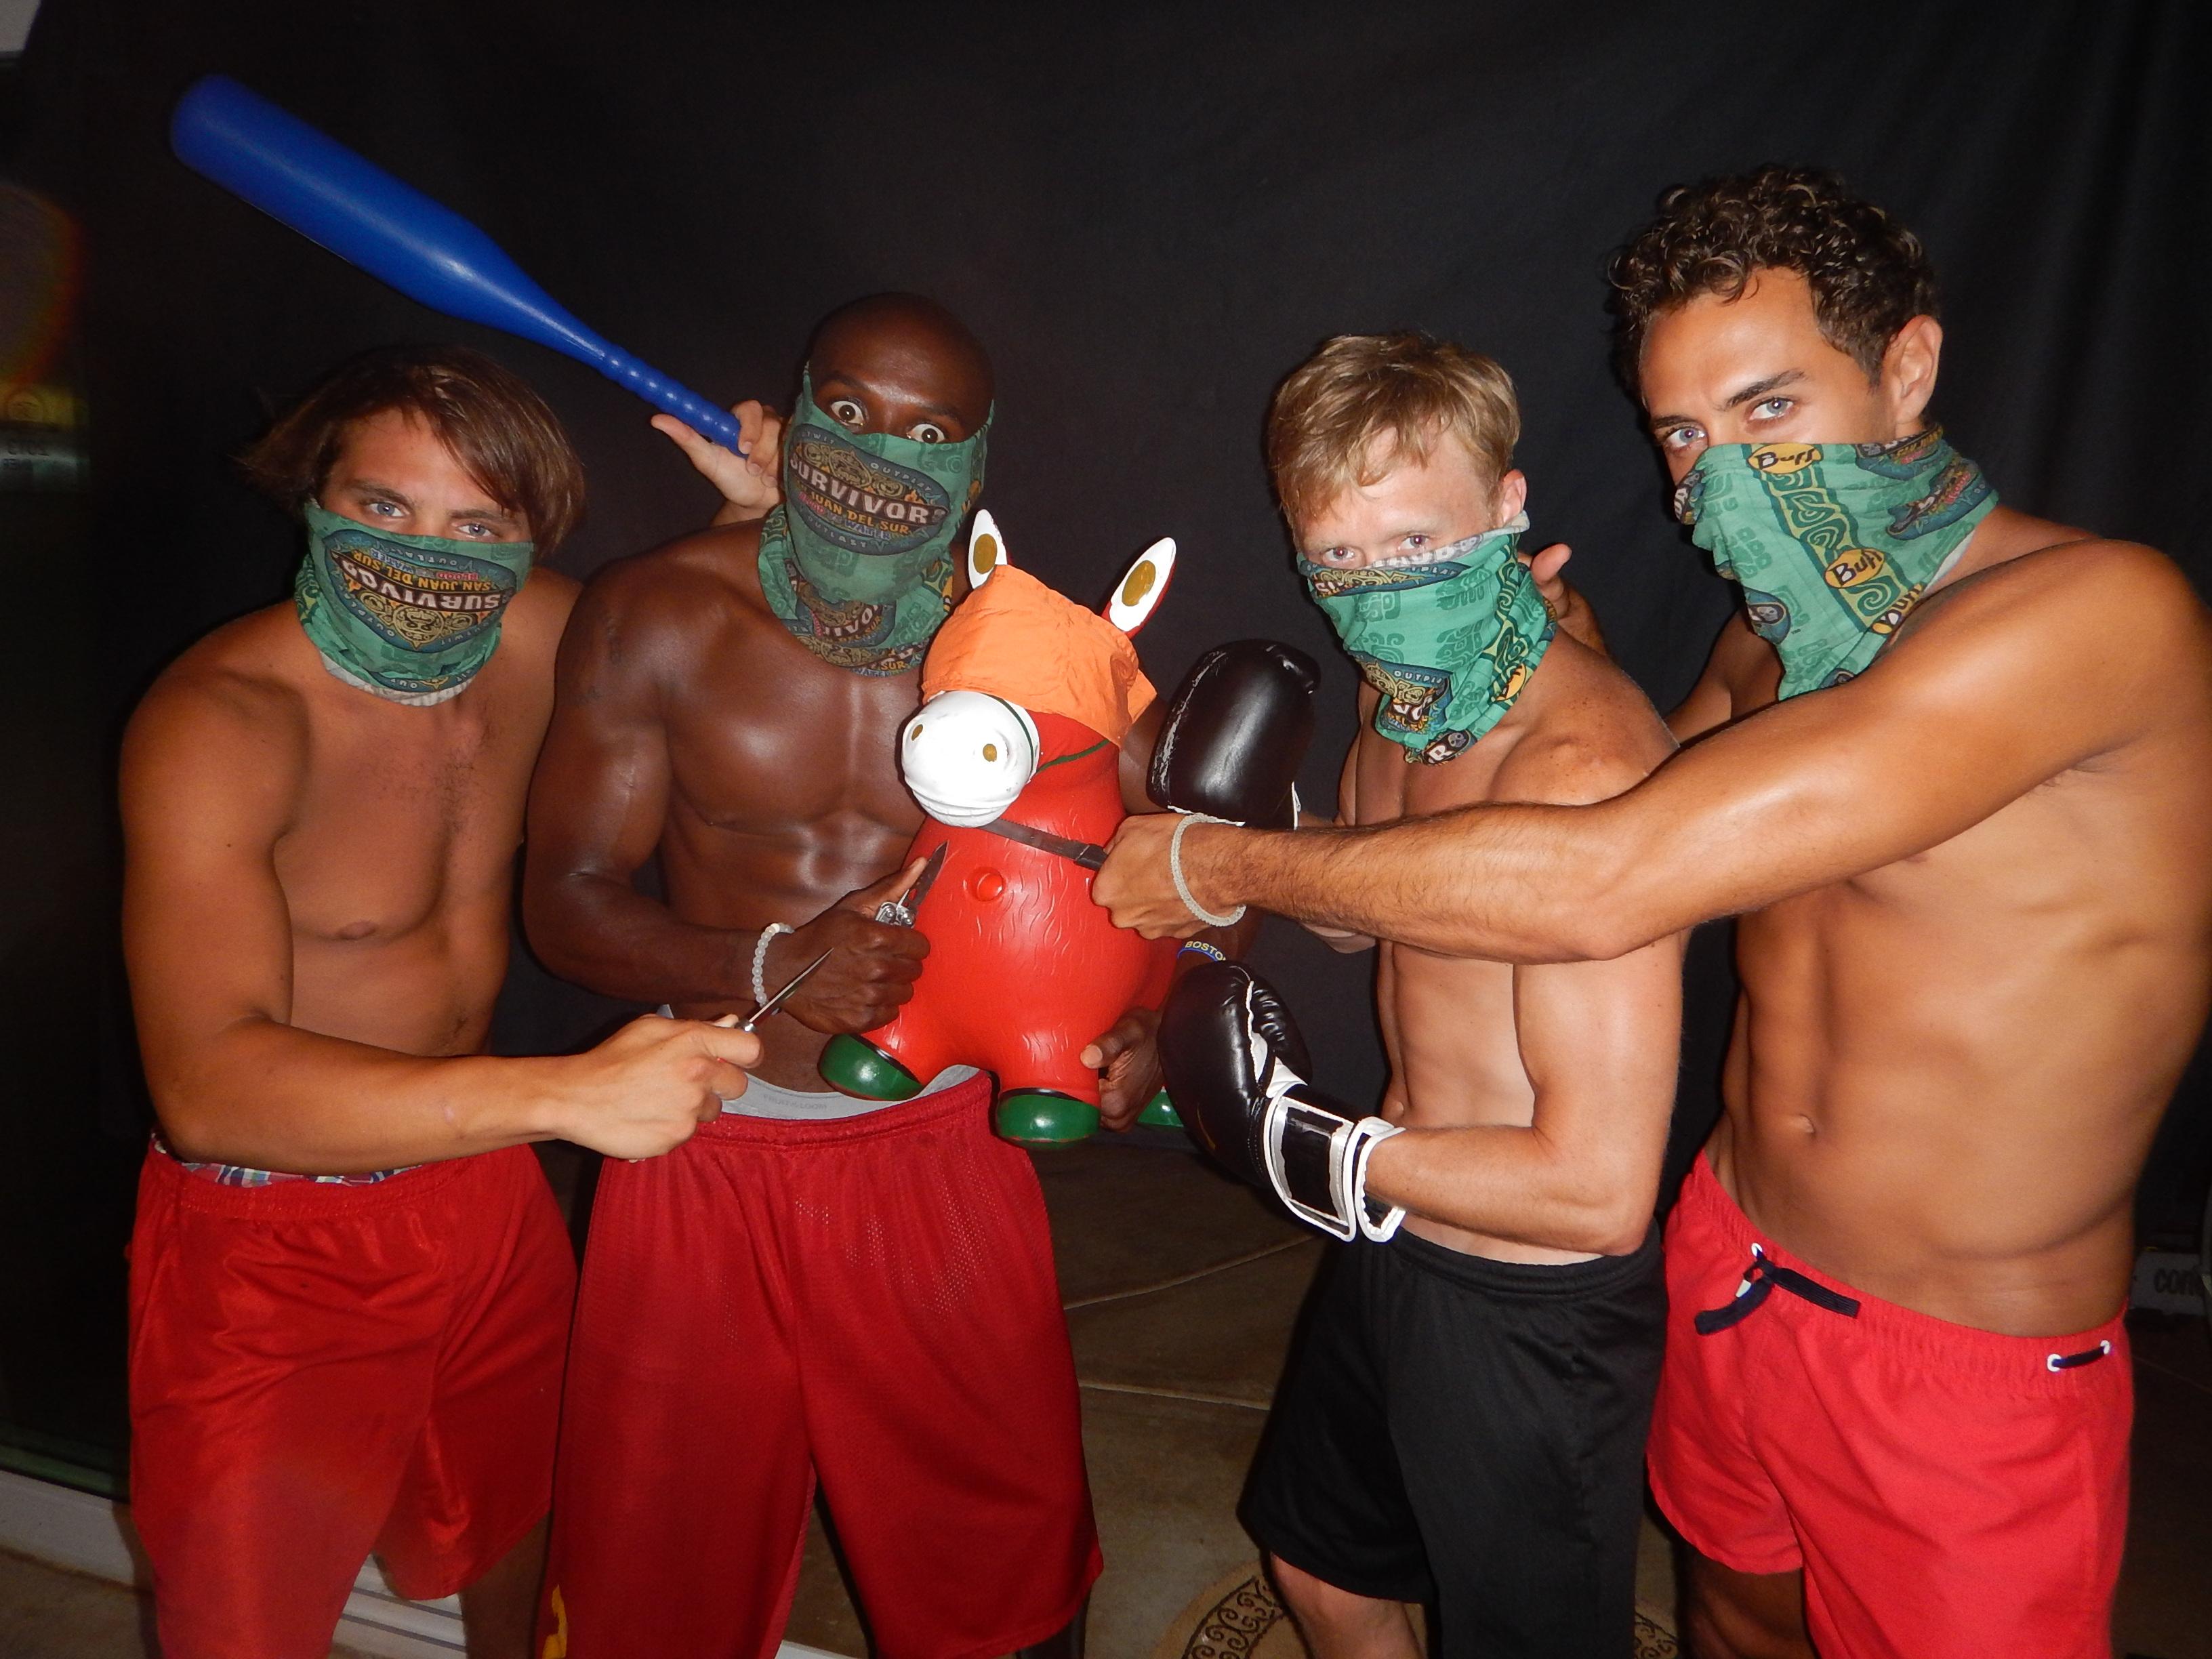 Four guys on Ponderosa